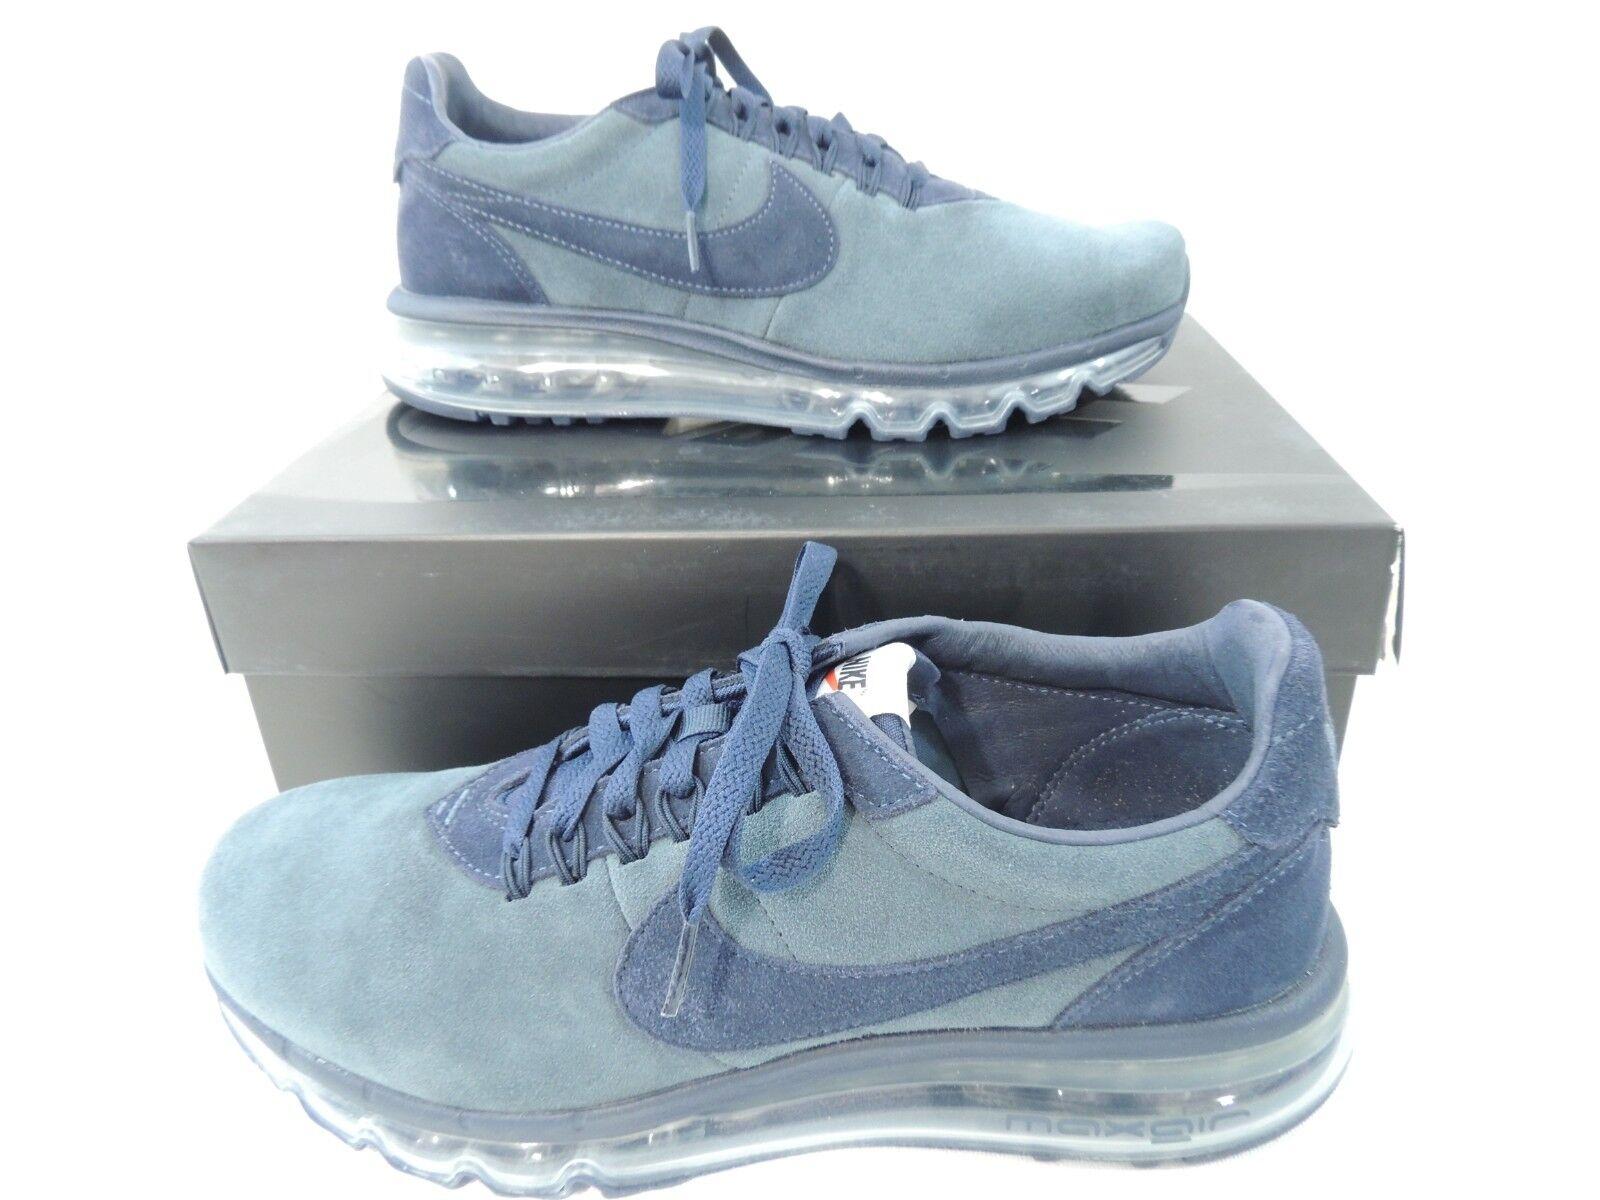 Nike Mens Air Max LD Zero Fragment Fragment Fragment Hiroshi Fujiwara bluee Grey 848624-002 Sz 9.5 5365d9